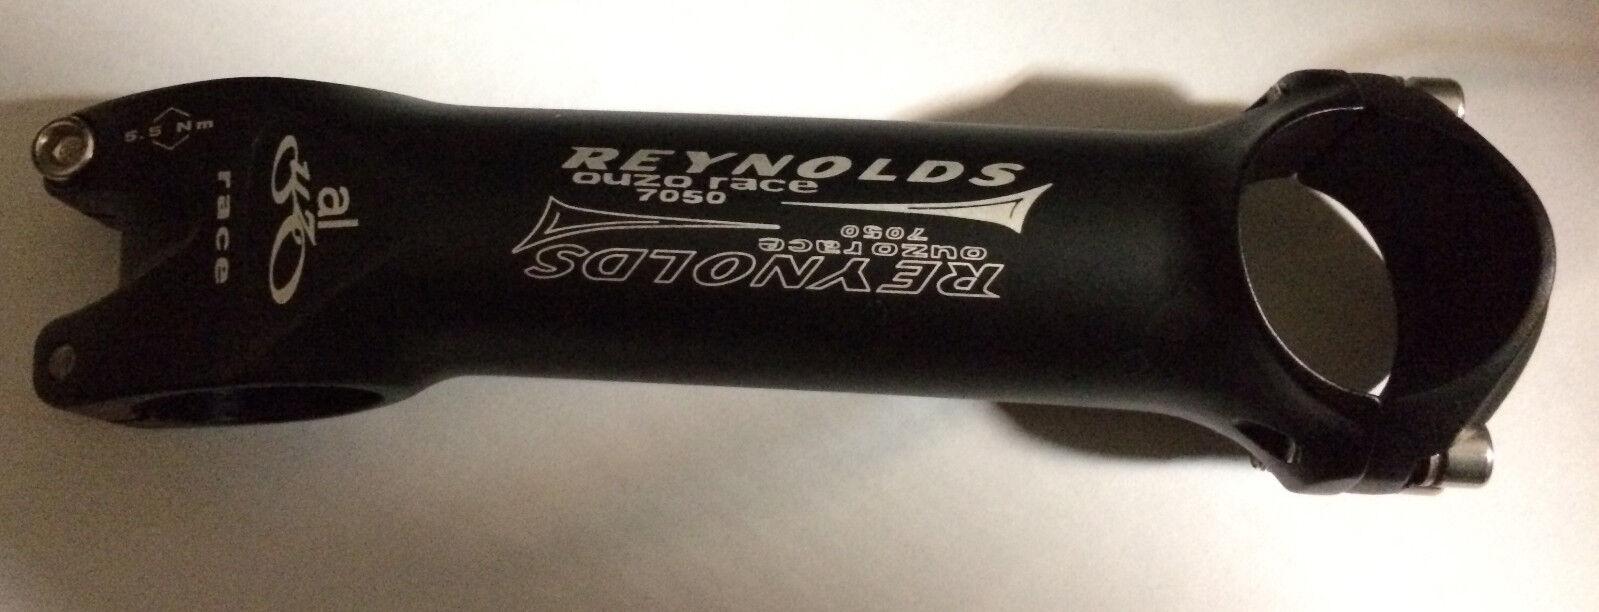 Attacco manubrio bici corsa Reynolds Ouzo  race 7050 road handlebar stem 31,8  clearance up to 70%